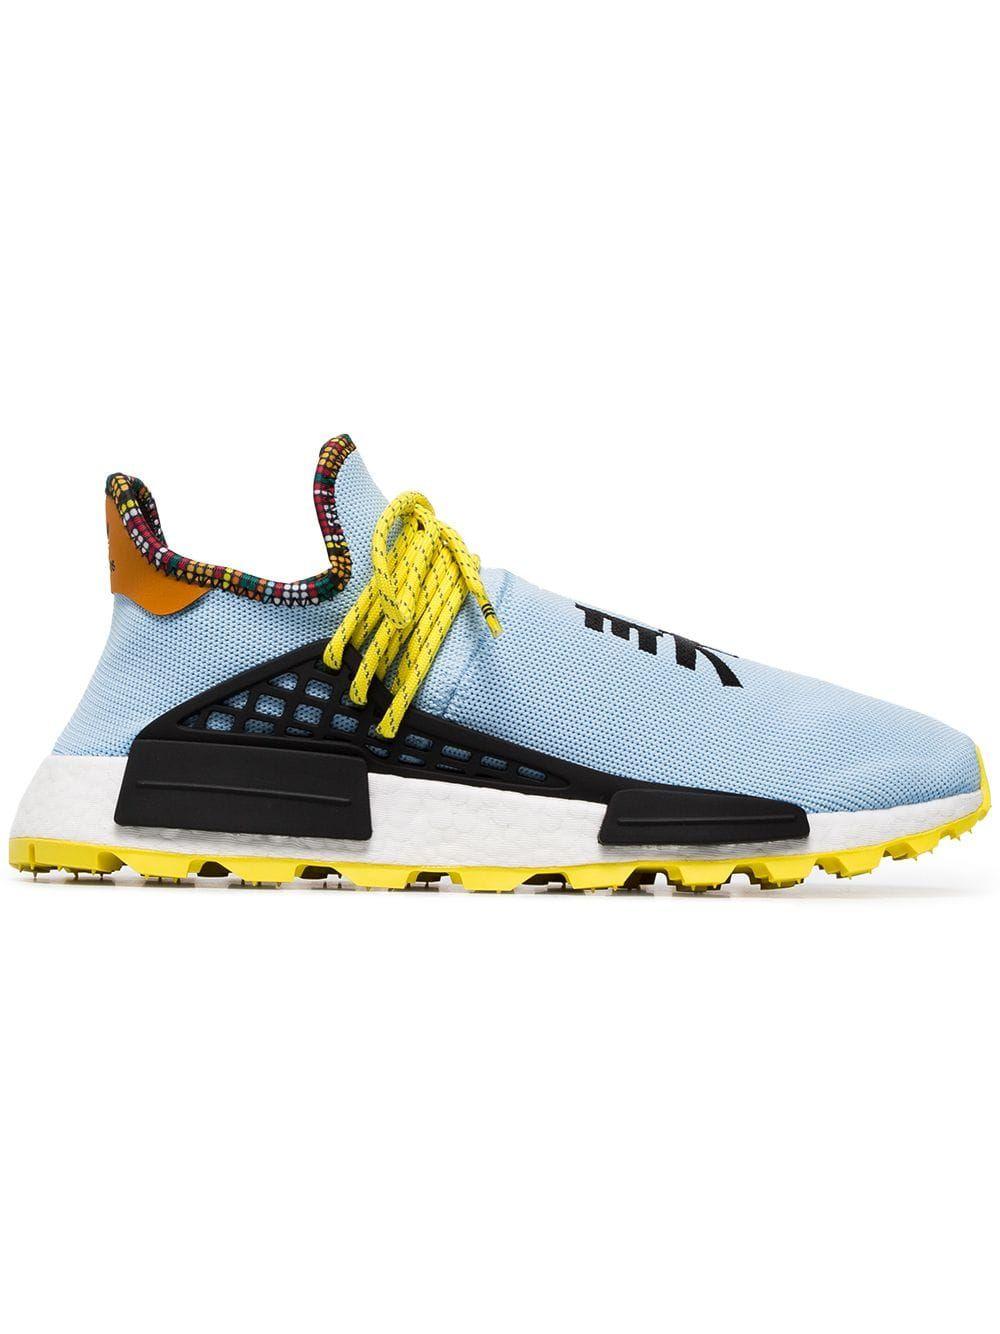 Adidas By Pharrell Williams x Pharrell Williams